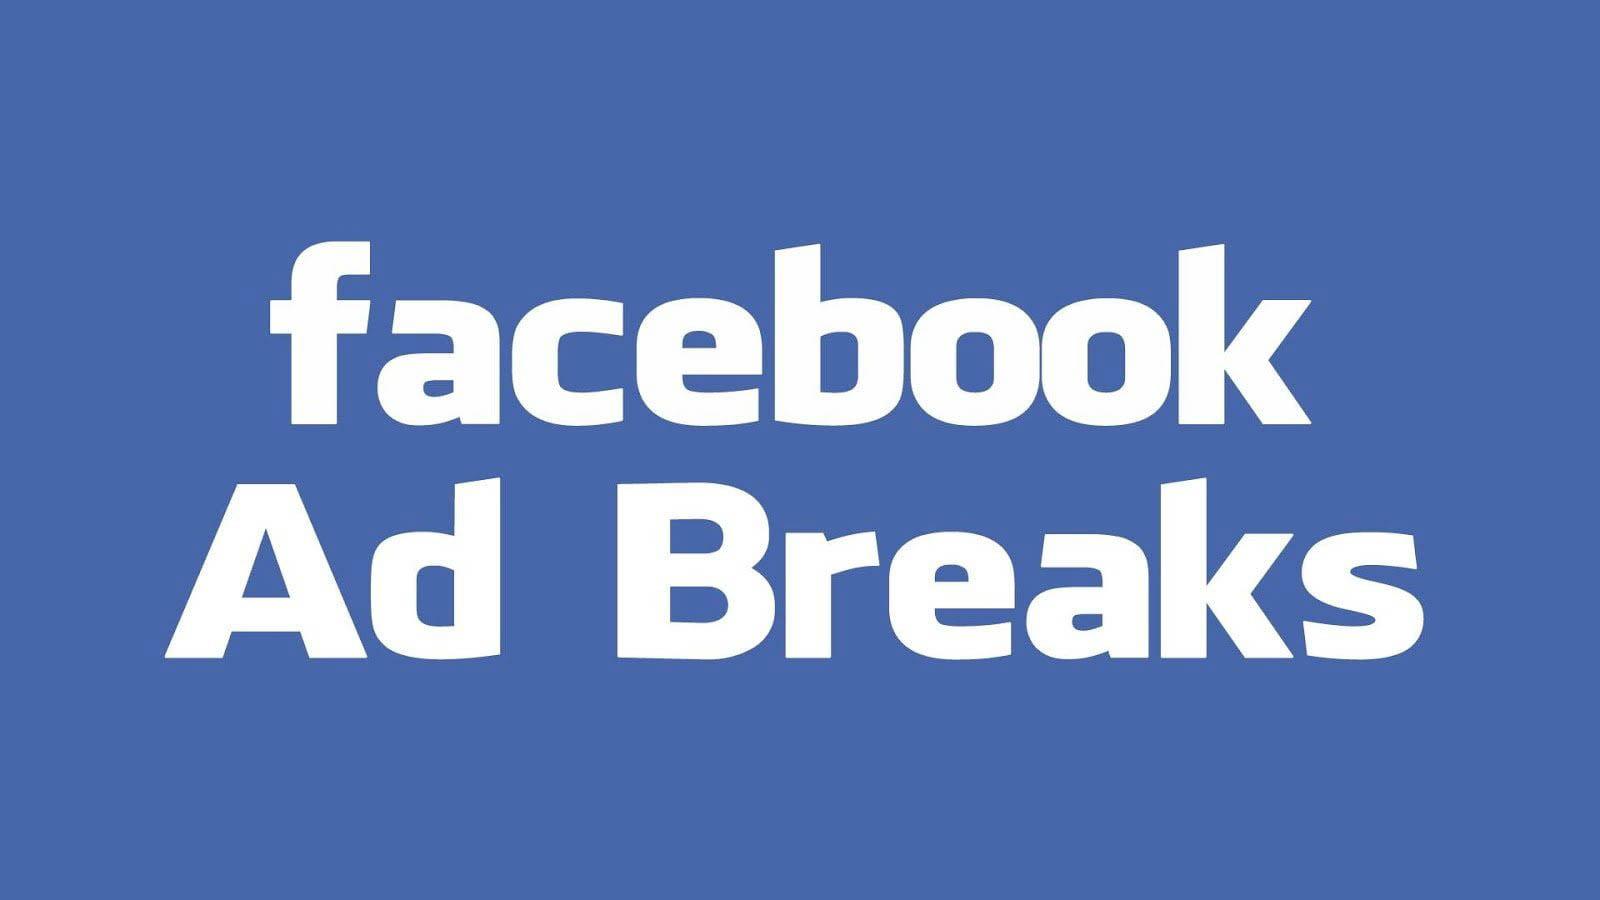 Facebook-Ads-Break